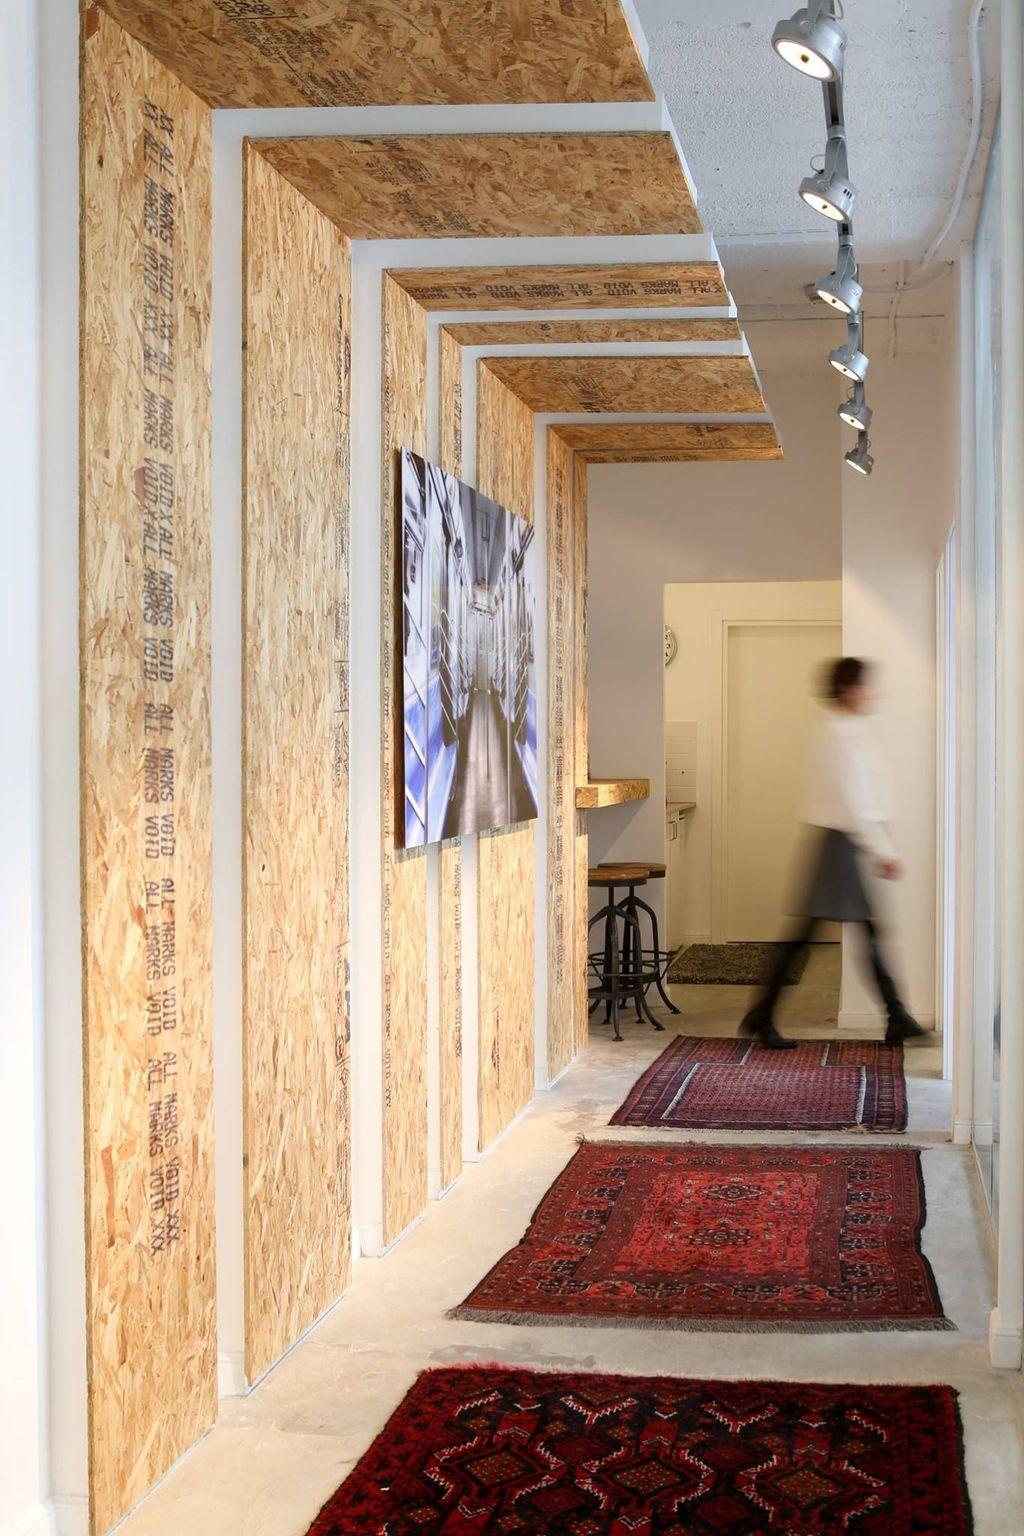 The Best Office Artwork Design Ideas 17